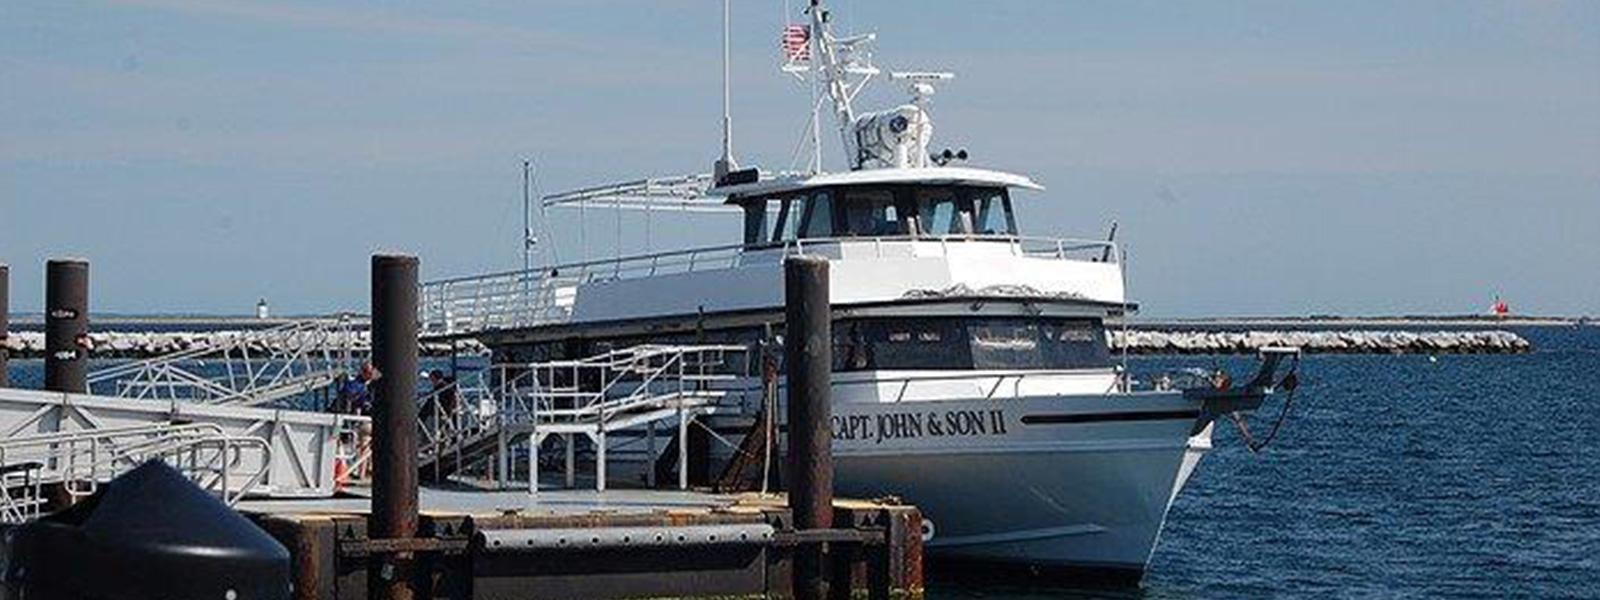 Captain John & Son II Ferry Cruise